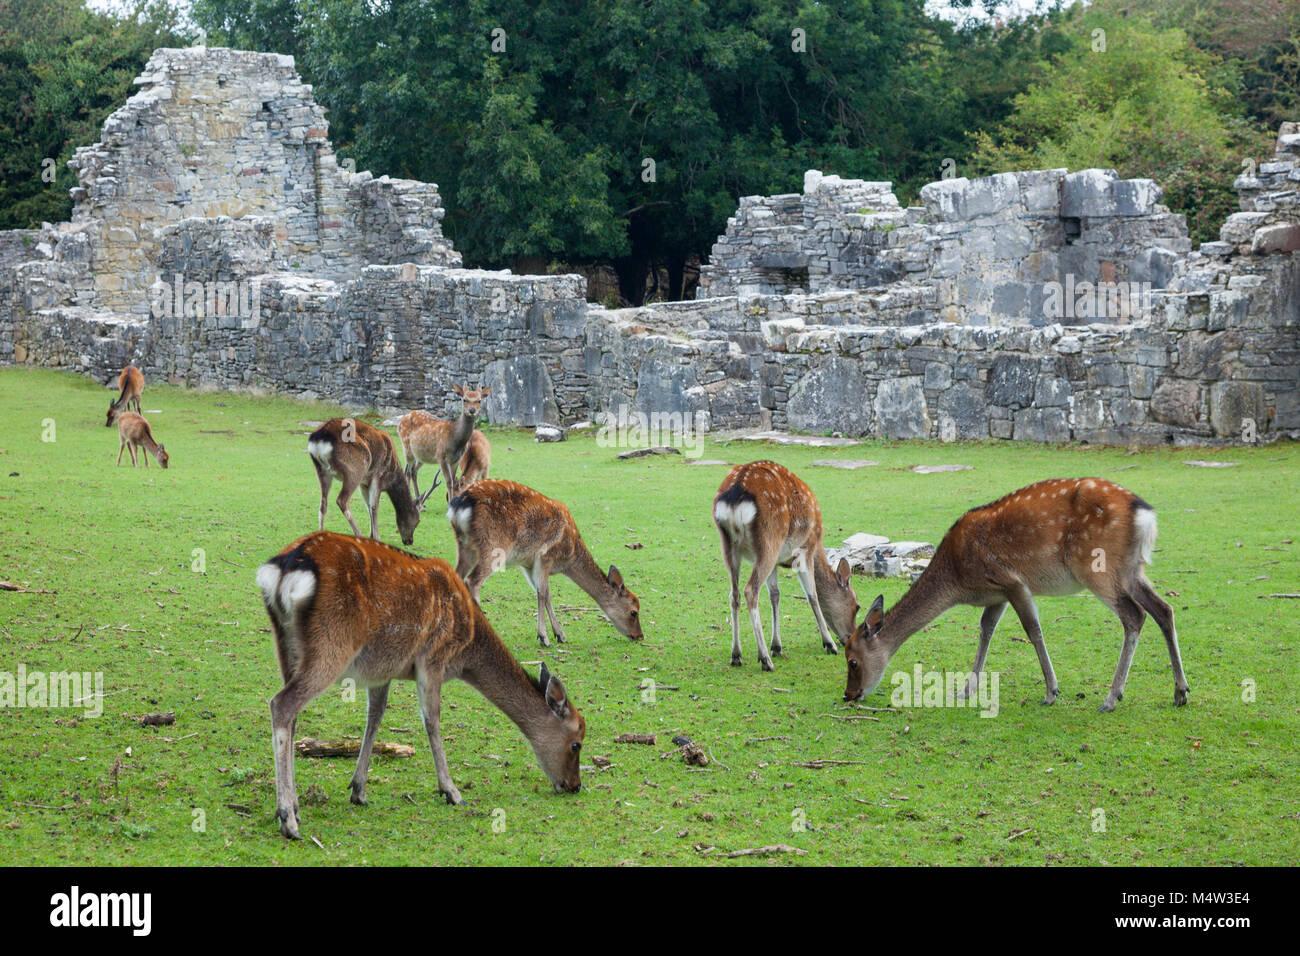 Sika deer and abbey ruins on Innishfallen Island, Killarney National Park, County Kerry, Ireland. - Stock Image